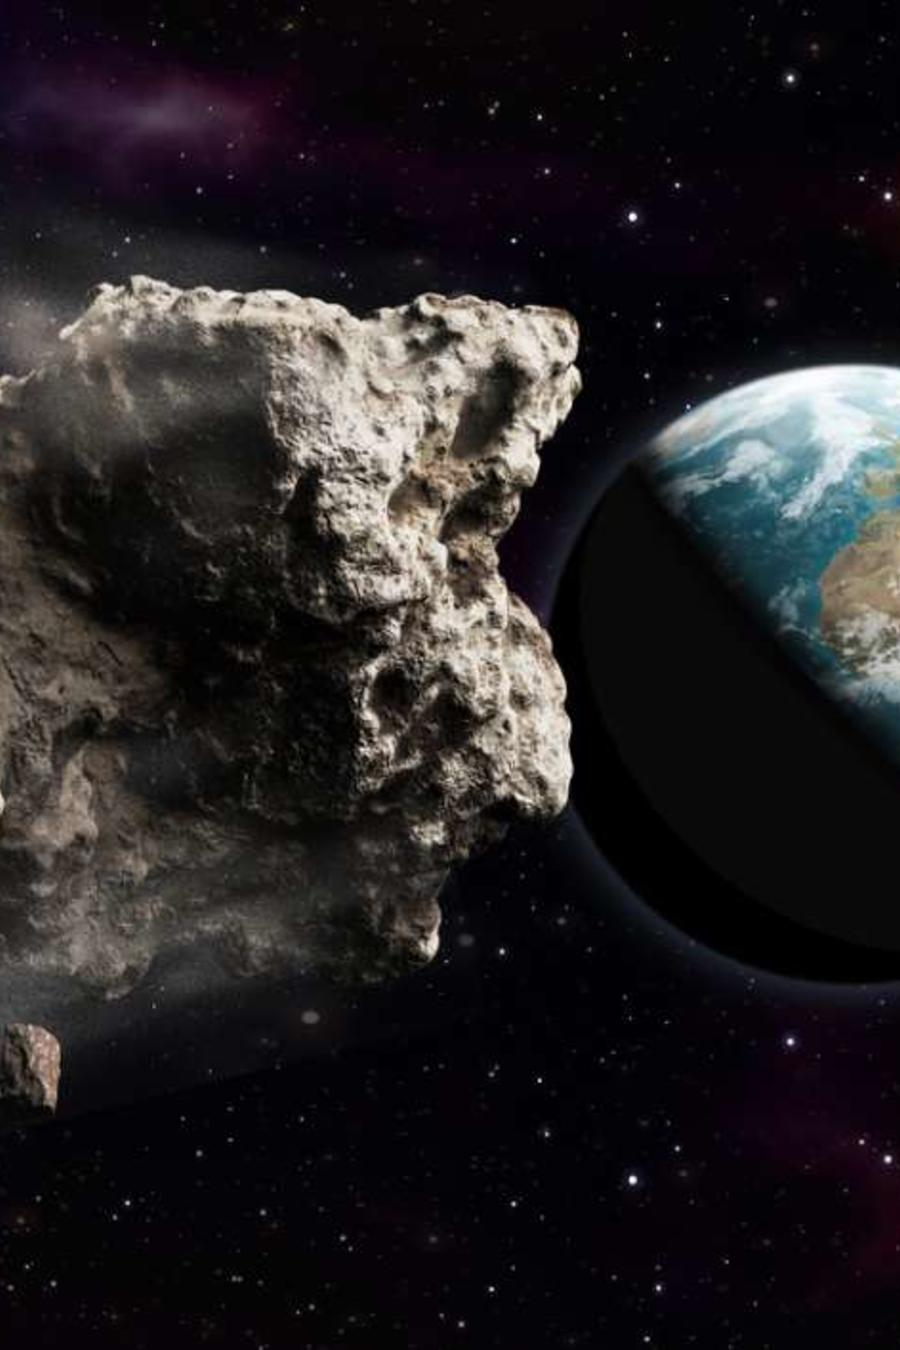 De momento, la NASA descarta que exista peligro inminente.